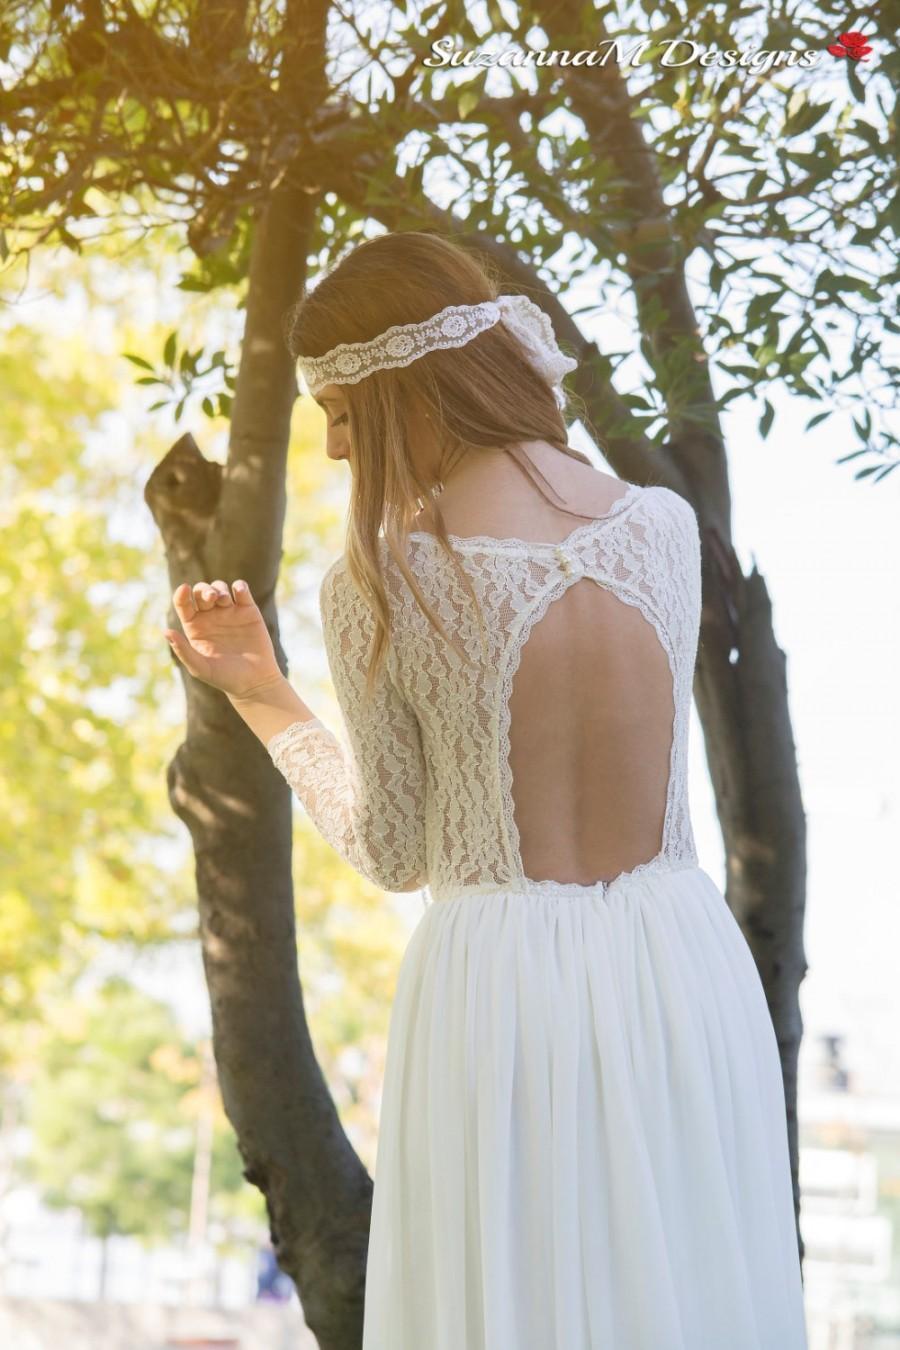 Свадьба - Wedding Dress, Long Bridal Gown, Ivory Bridal Dress, Lace and Chiffon Wedding Gown, Long Sleeve Wedding Dress, Handmade by SuzannaM Designs